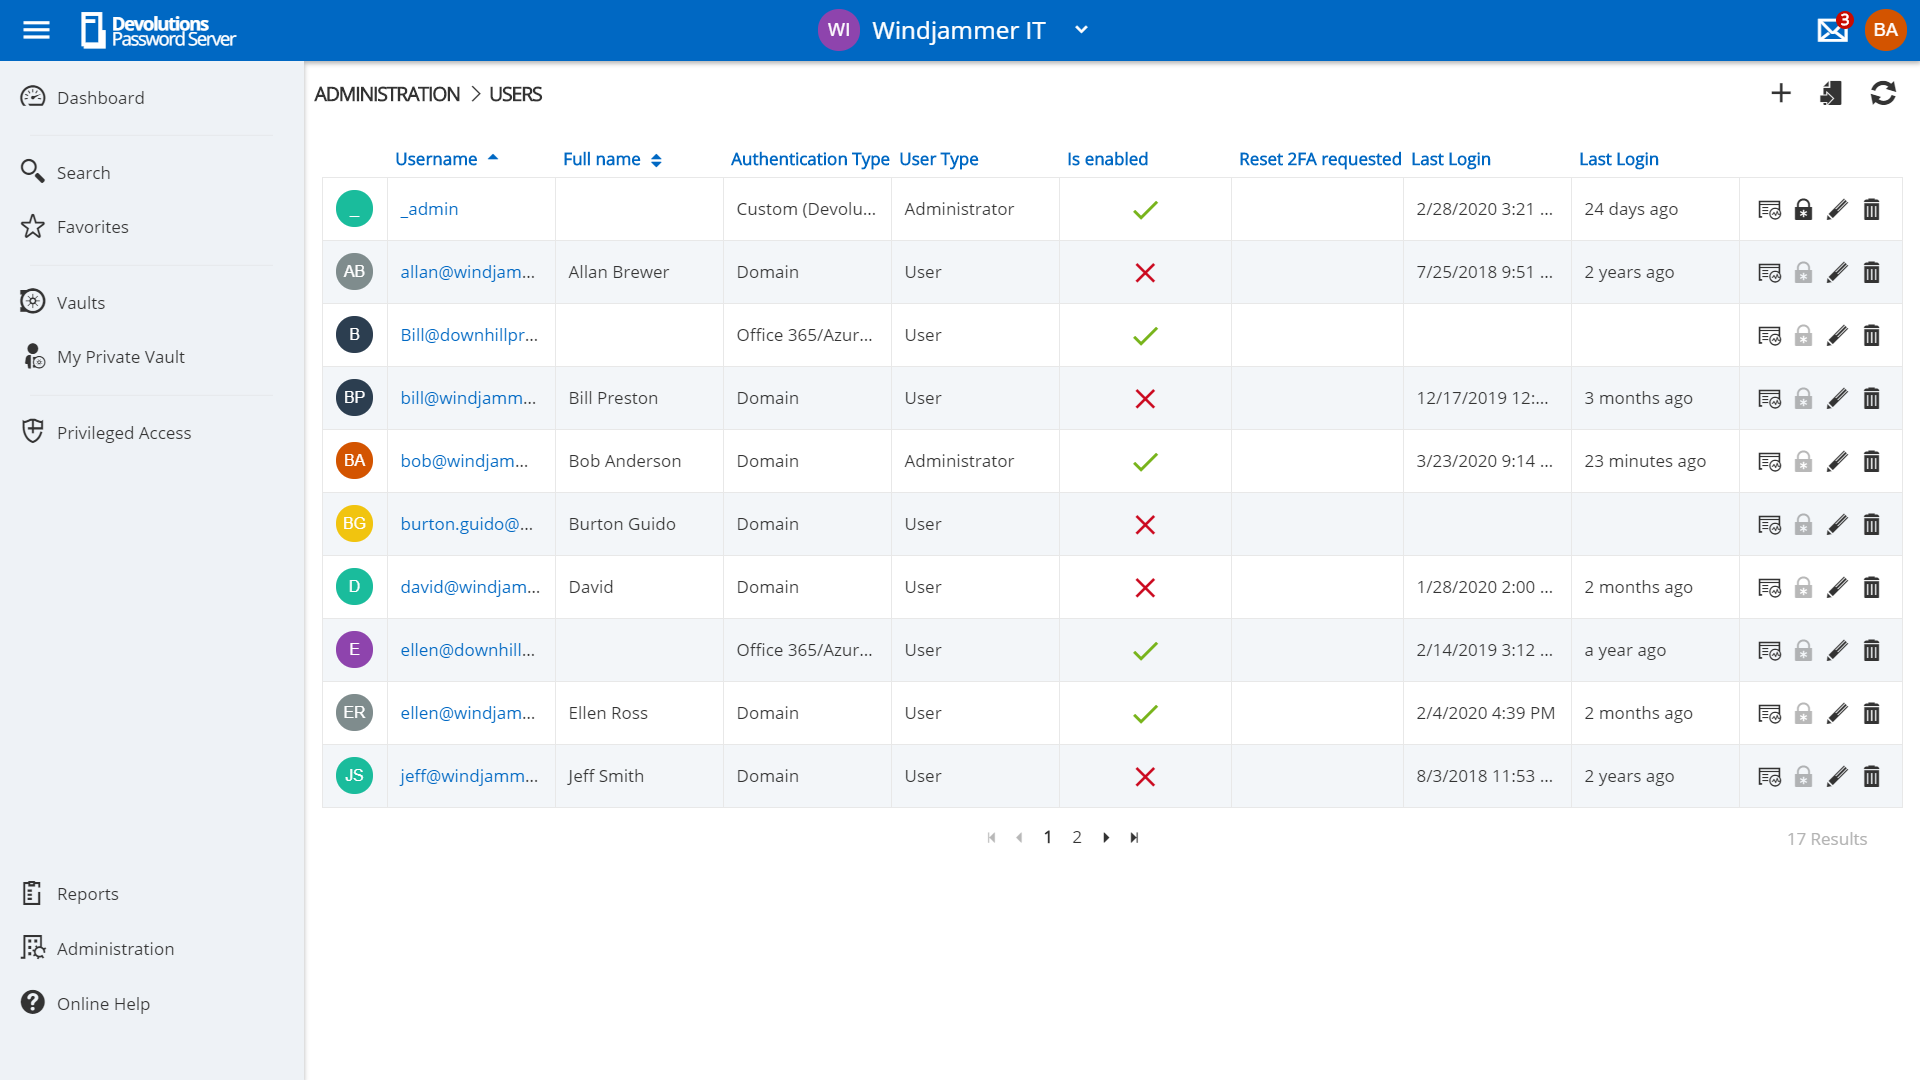 Devolutions Password Server Control Access